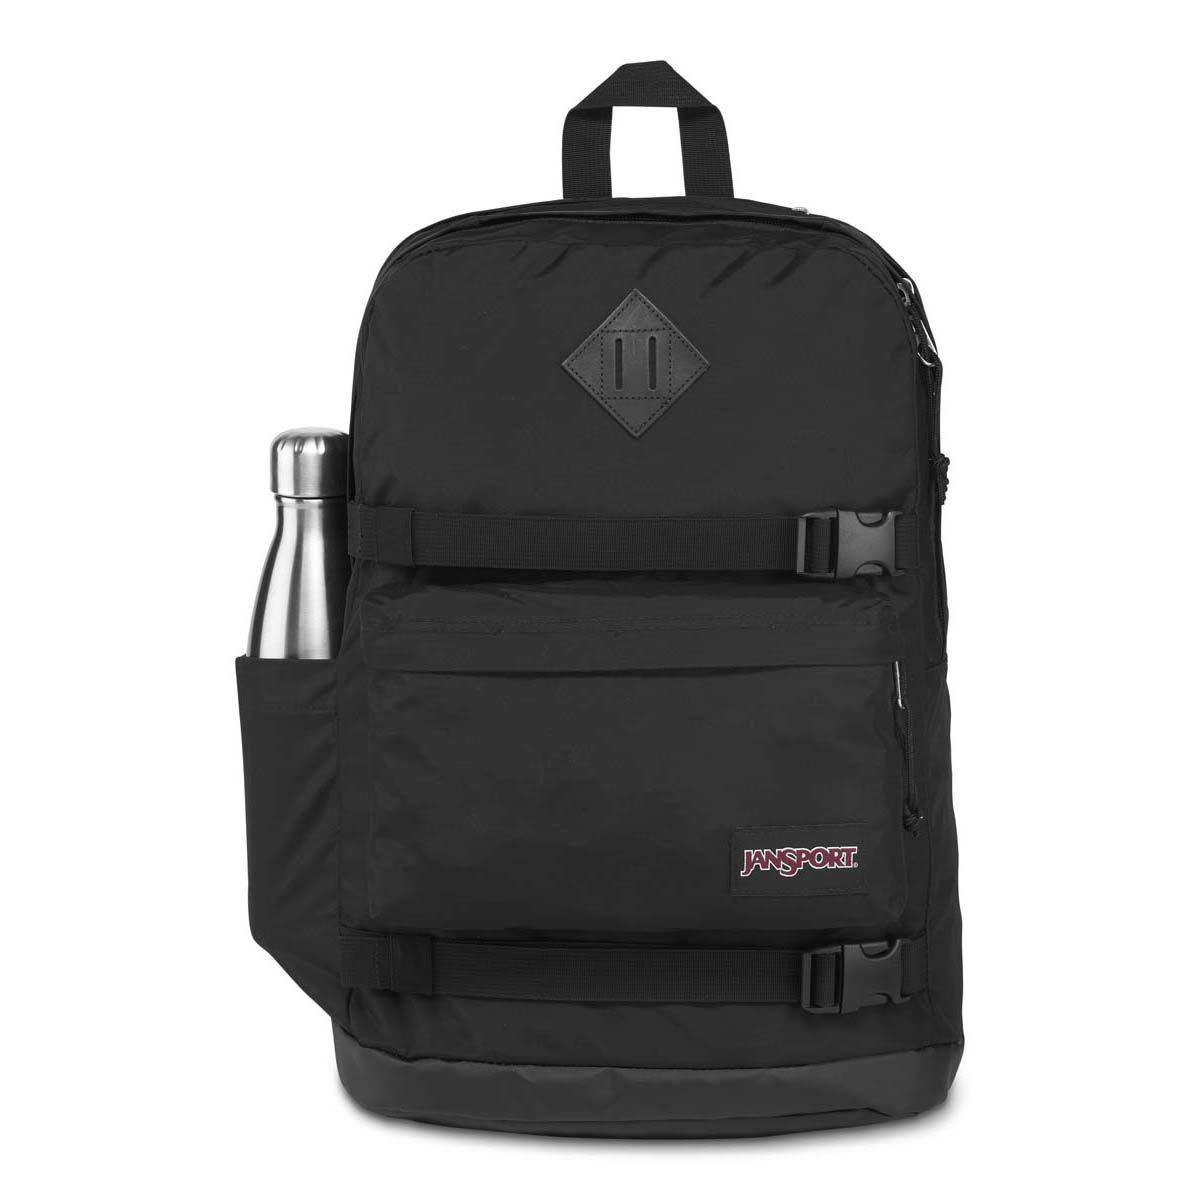 JanSport West Break Backpack in Black